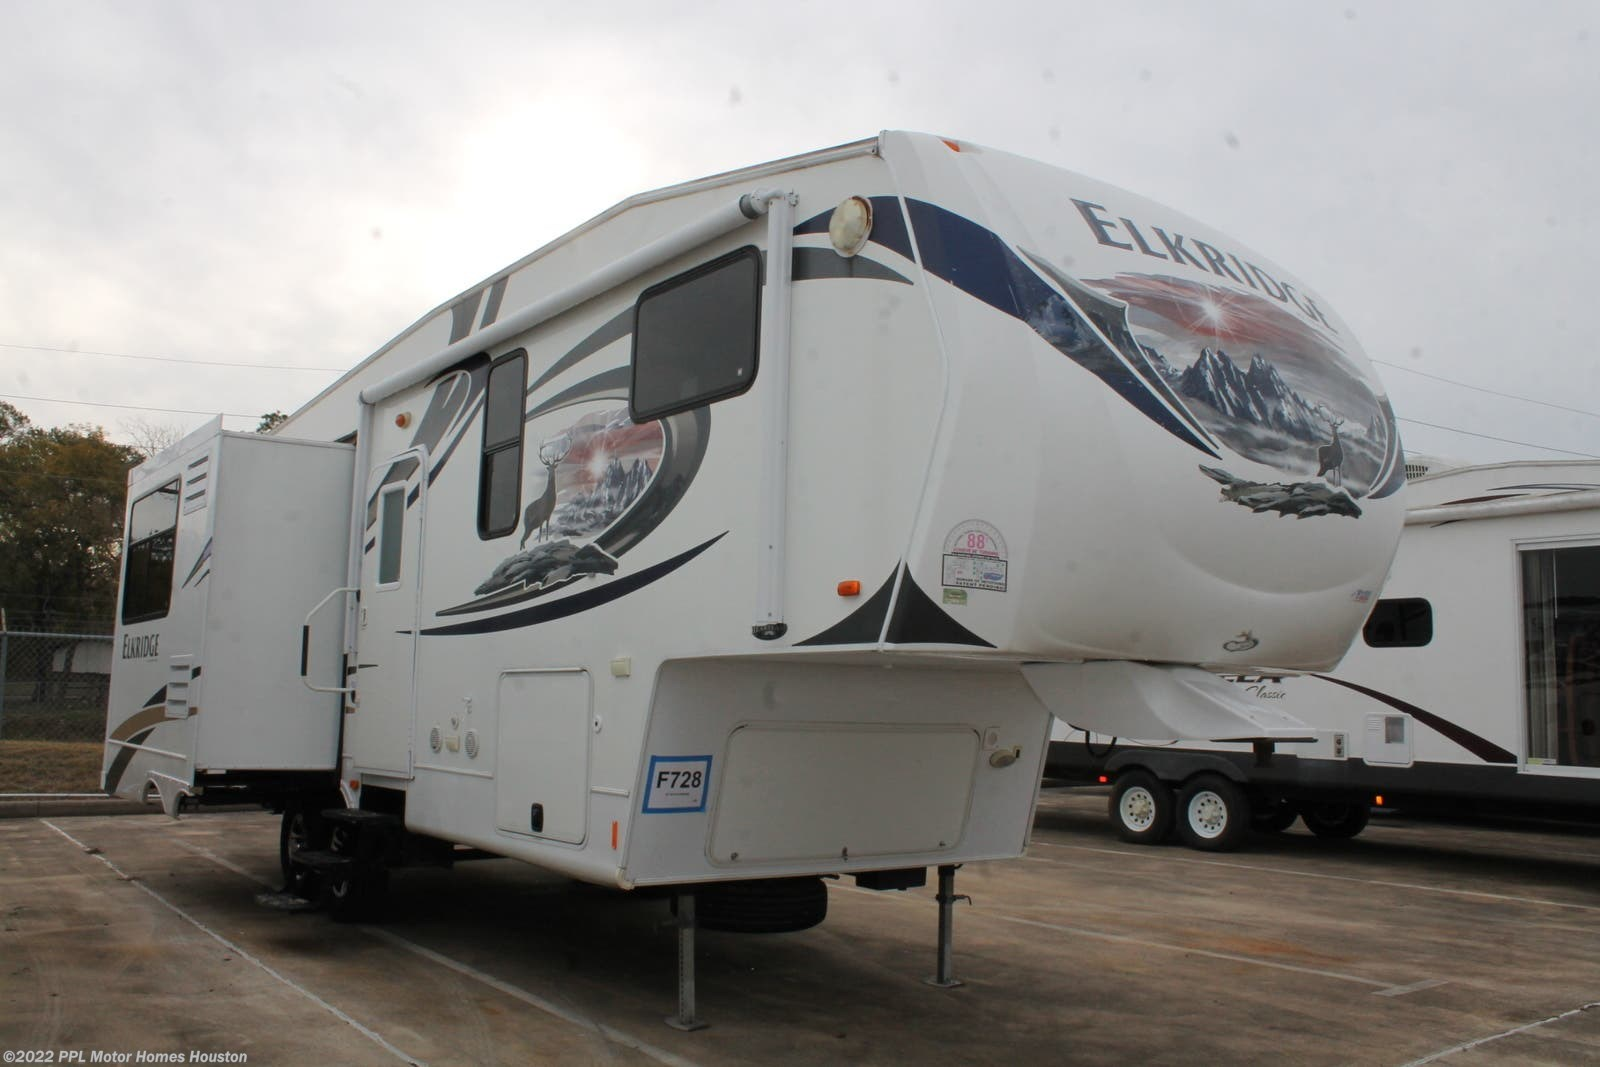 Used Rv Houston >> 2012 Heartland Rv Elkridge 28tsre For Sale In Houston Tx 77074 F728